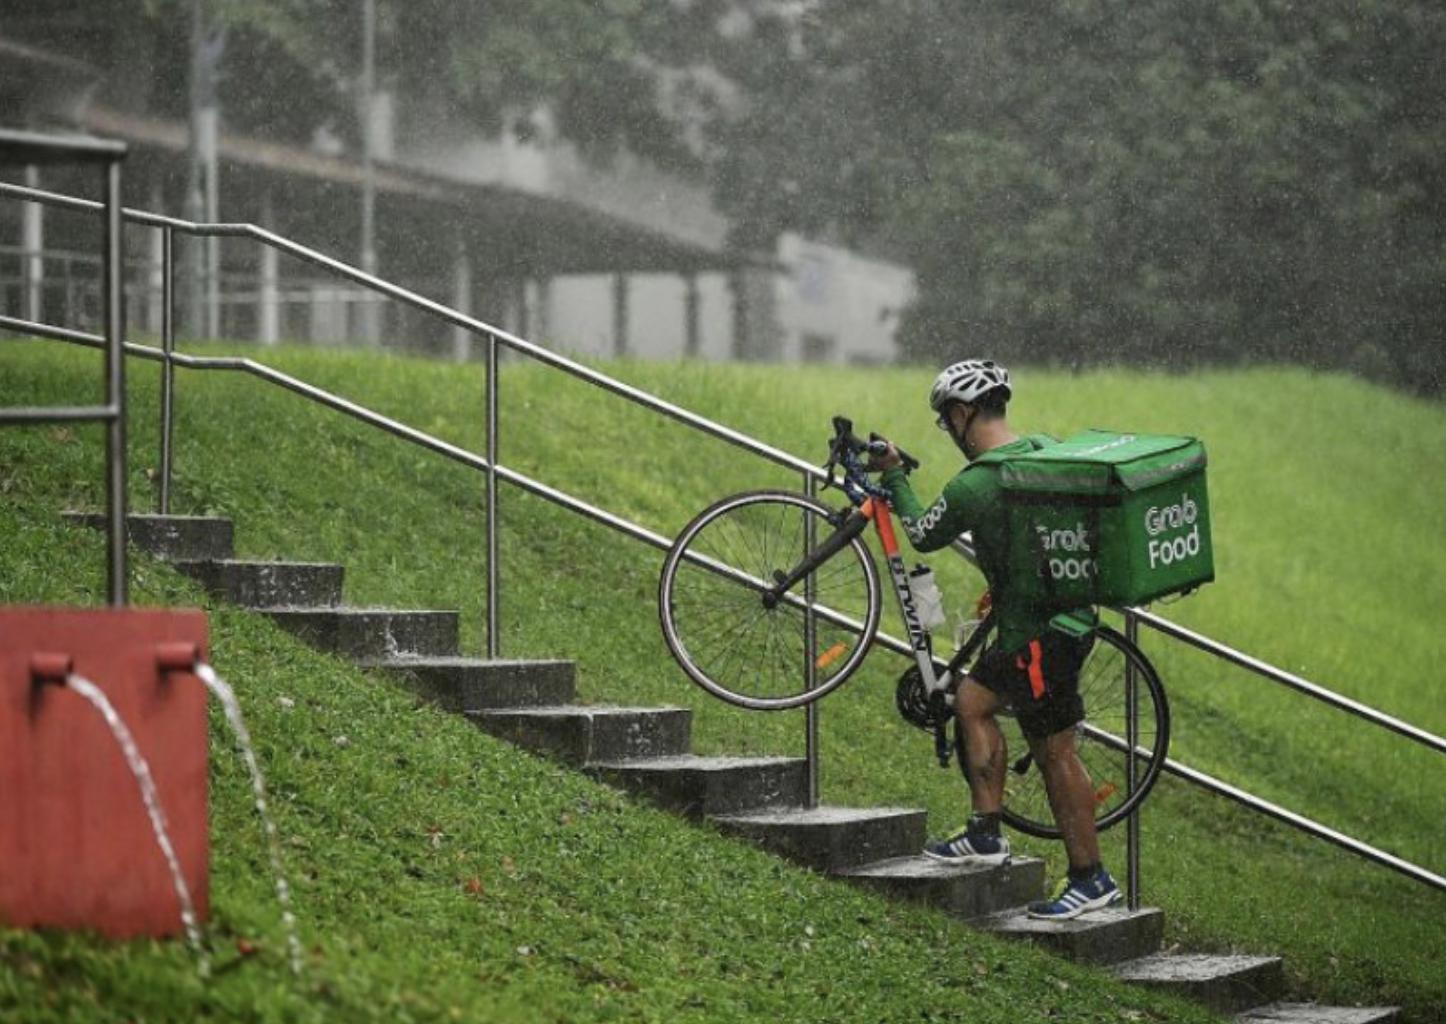 Grabfood rider carrying bike in rain